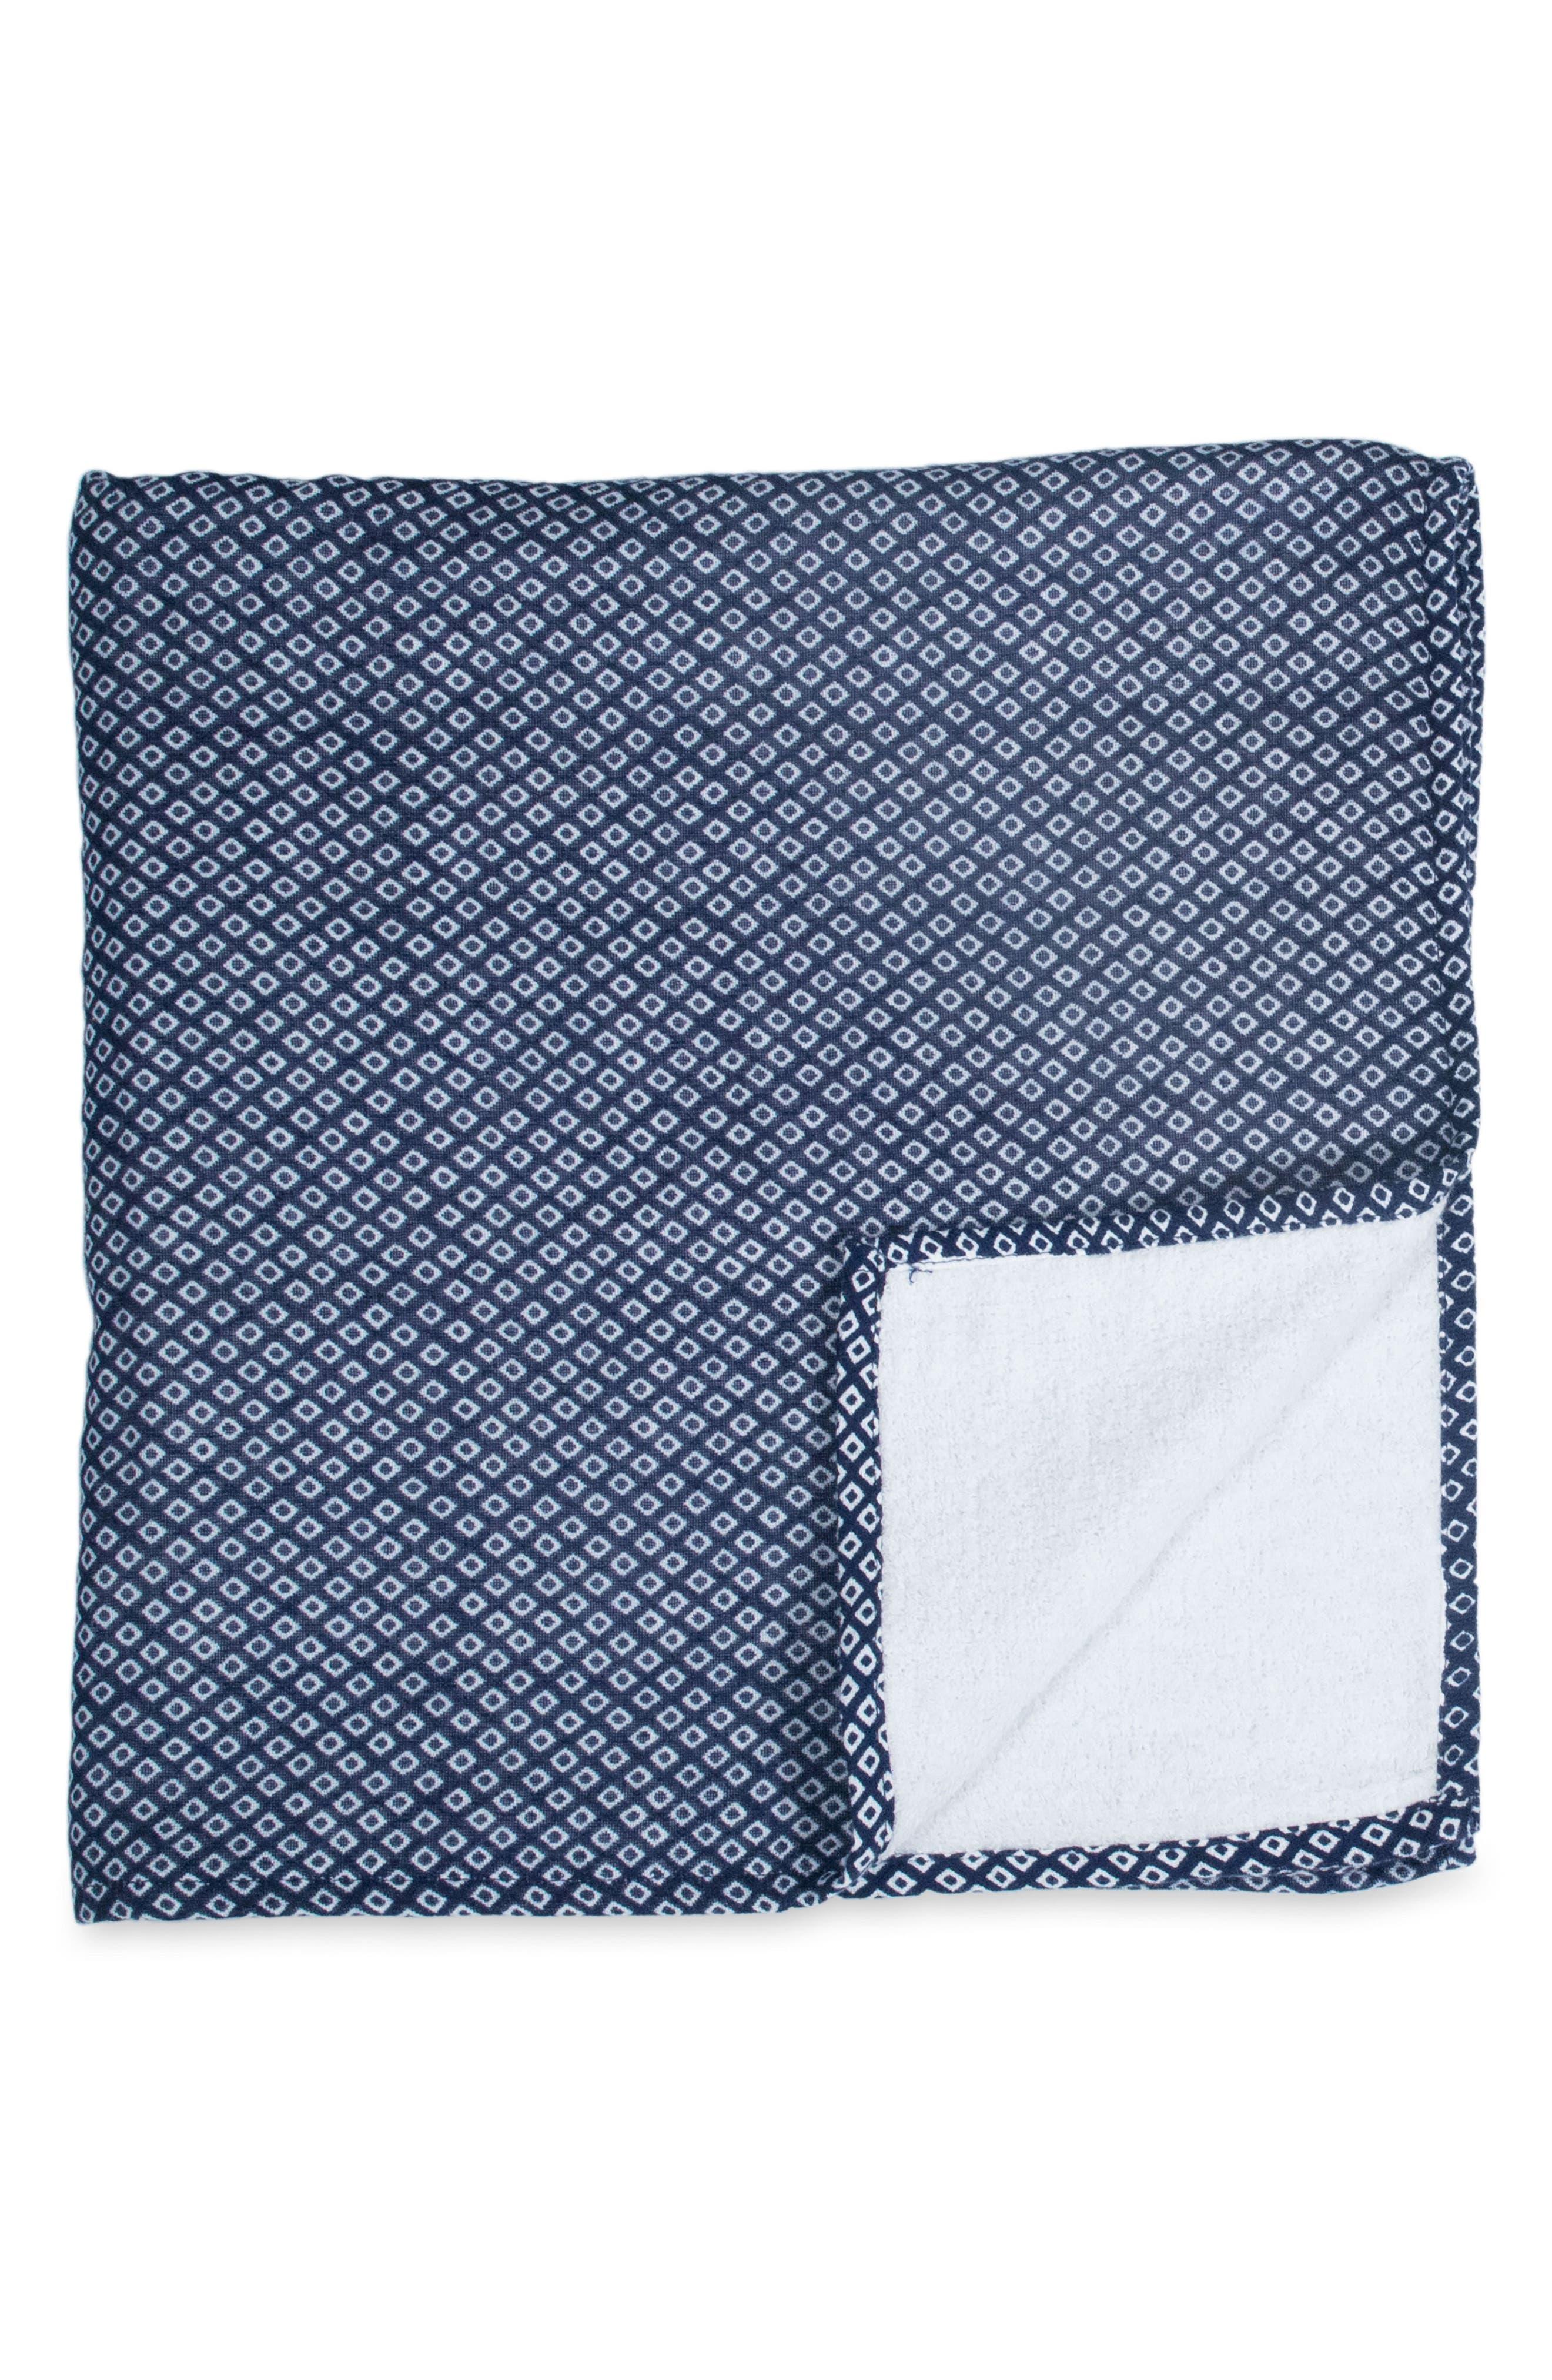 Alternate Image 1 Selected - Uchino Zero Twist Hishi Bath Towel